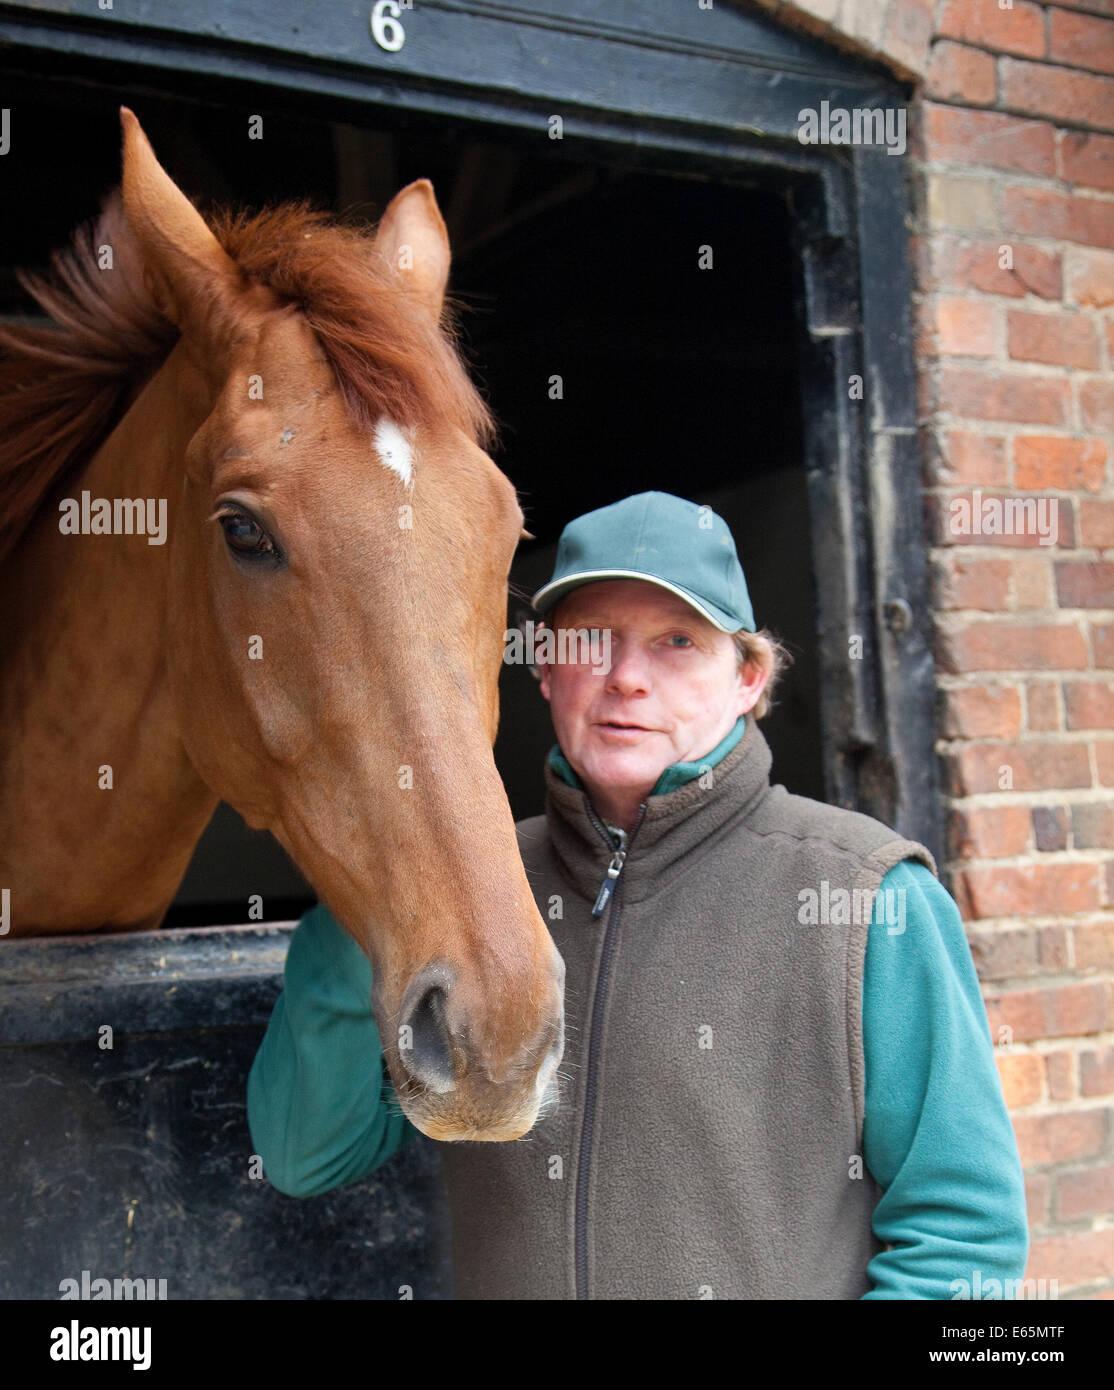 Racehorse trainer Paul Webber - Stock Image